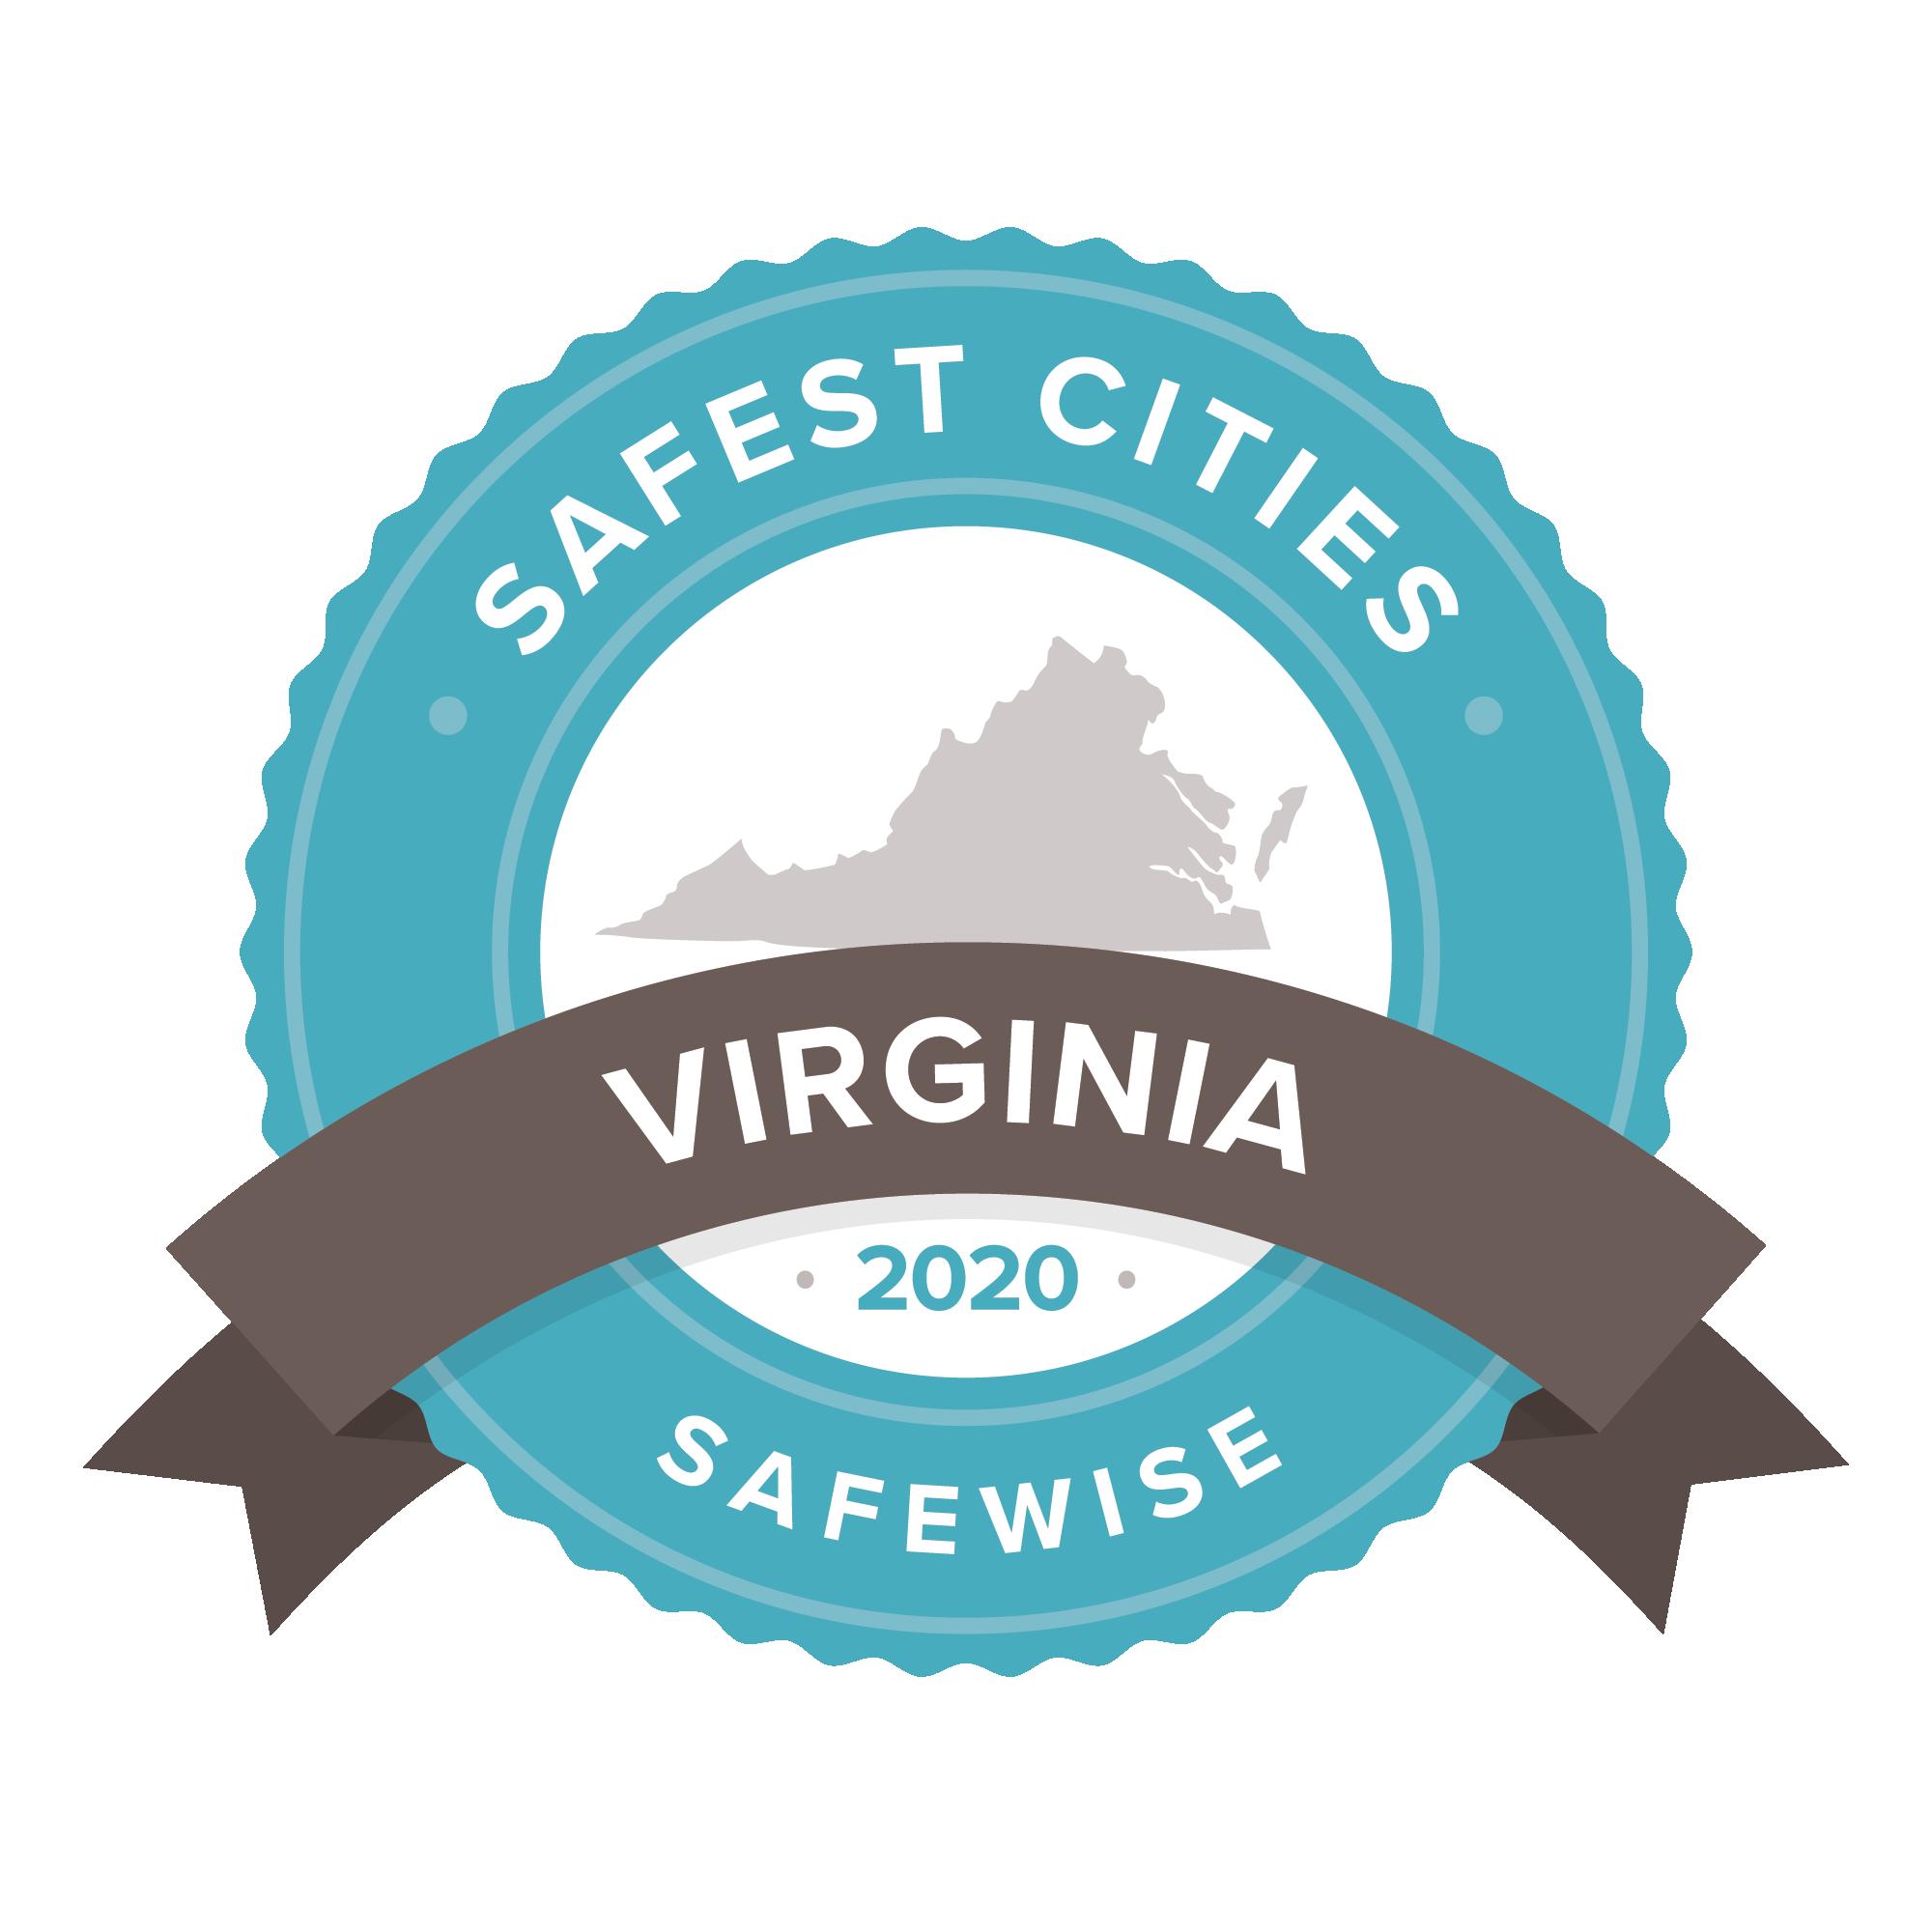 Safest Cities Virginia 2020 badge